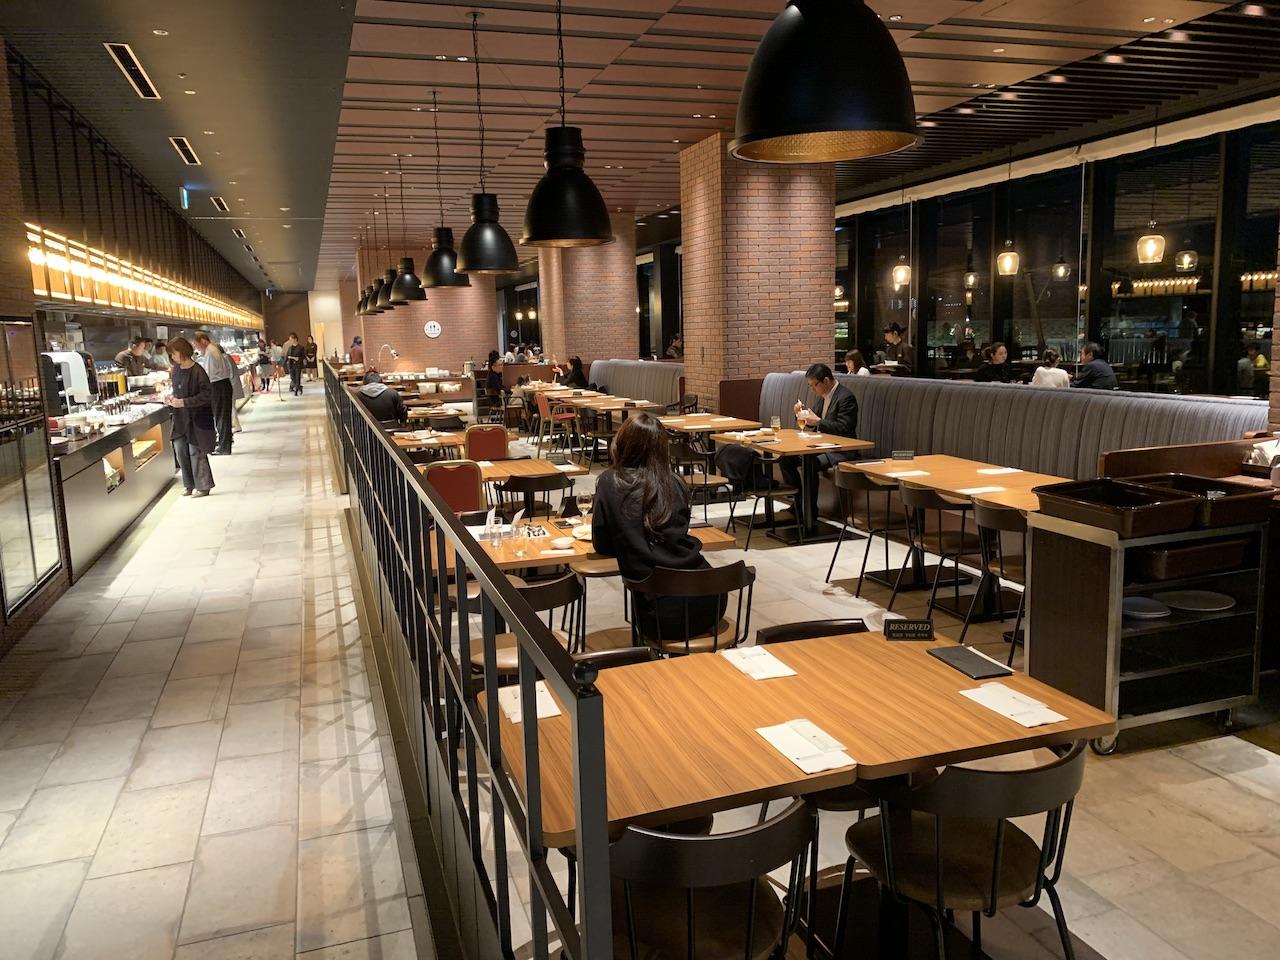 liber-hotel-usj-restaurant-brick-side-2